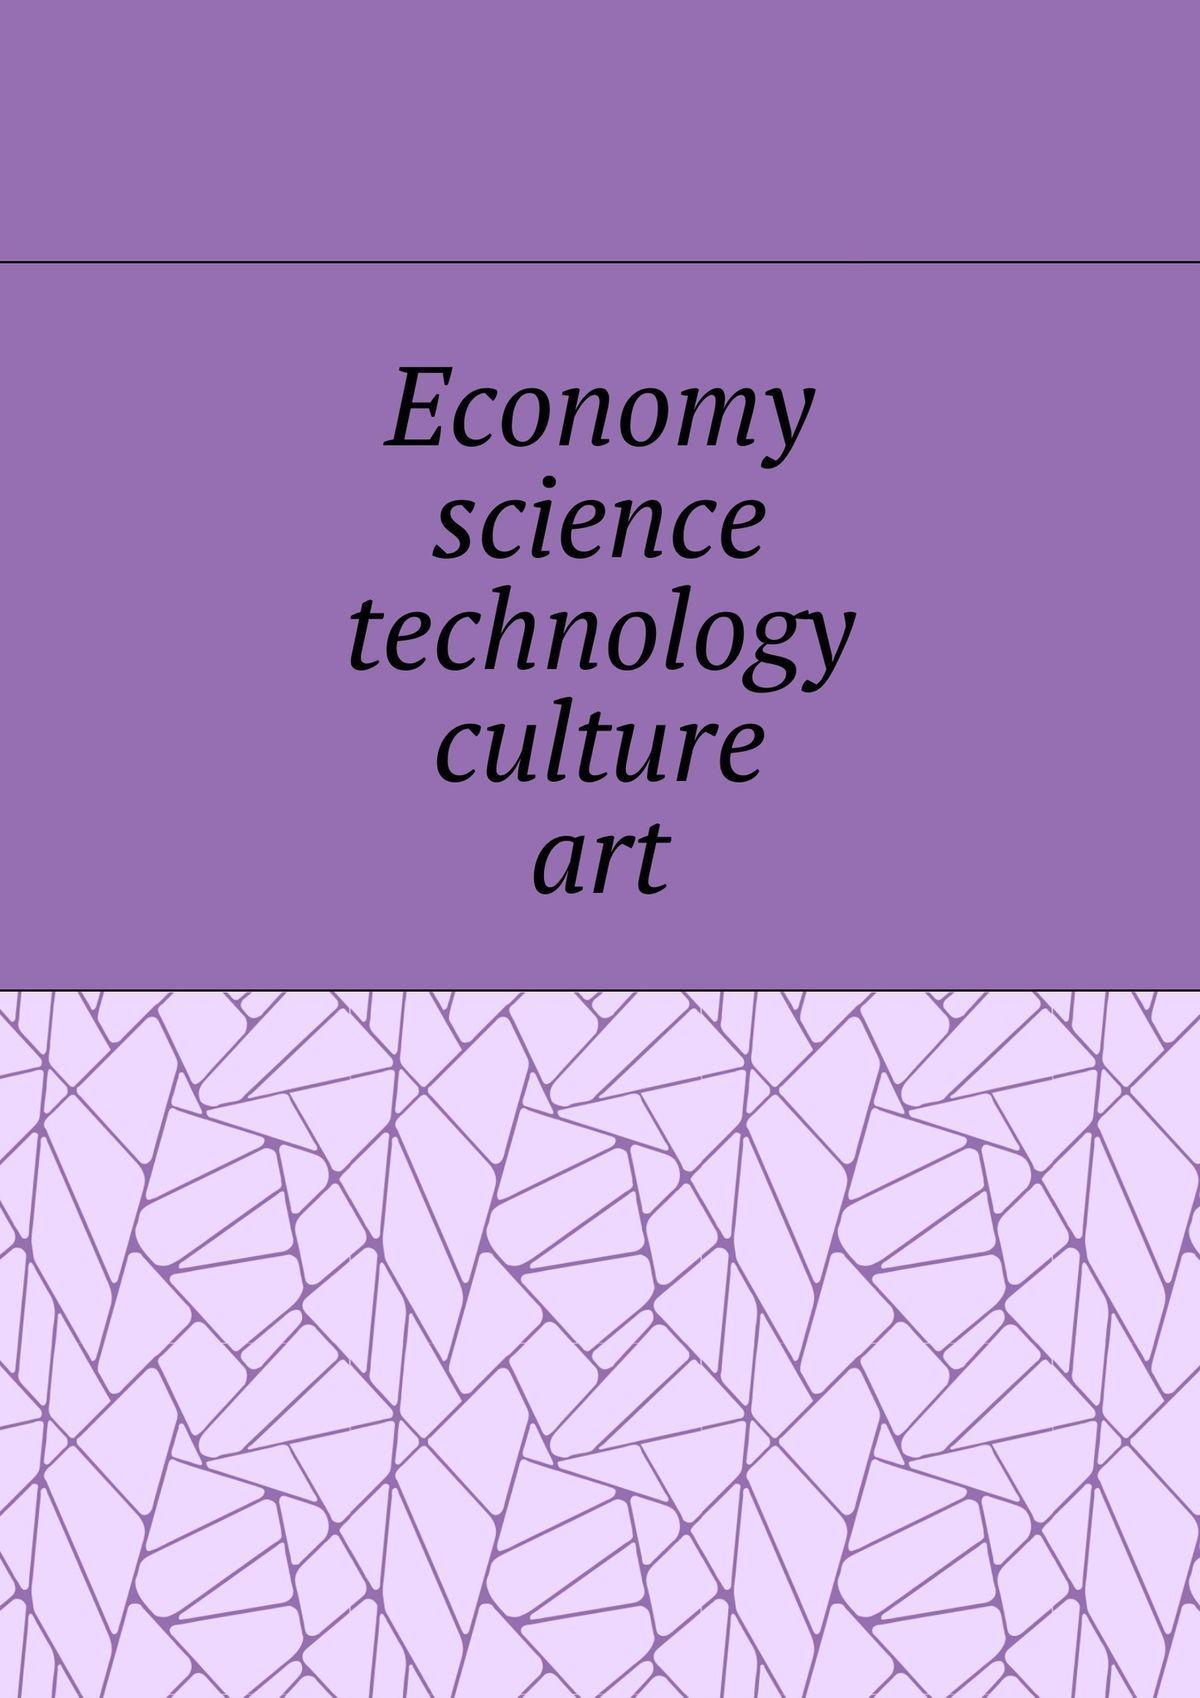 Елена Дильбанж - Economy, science, technology, culture, art